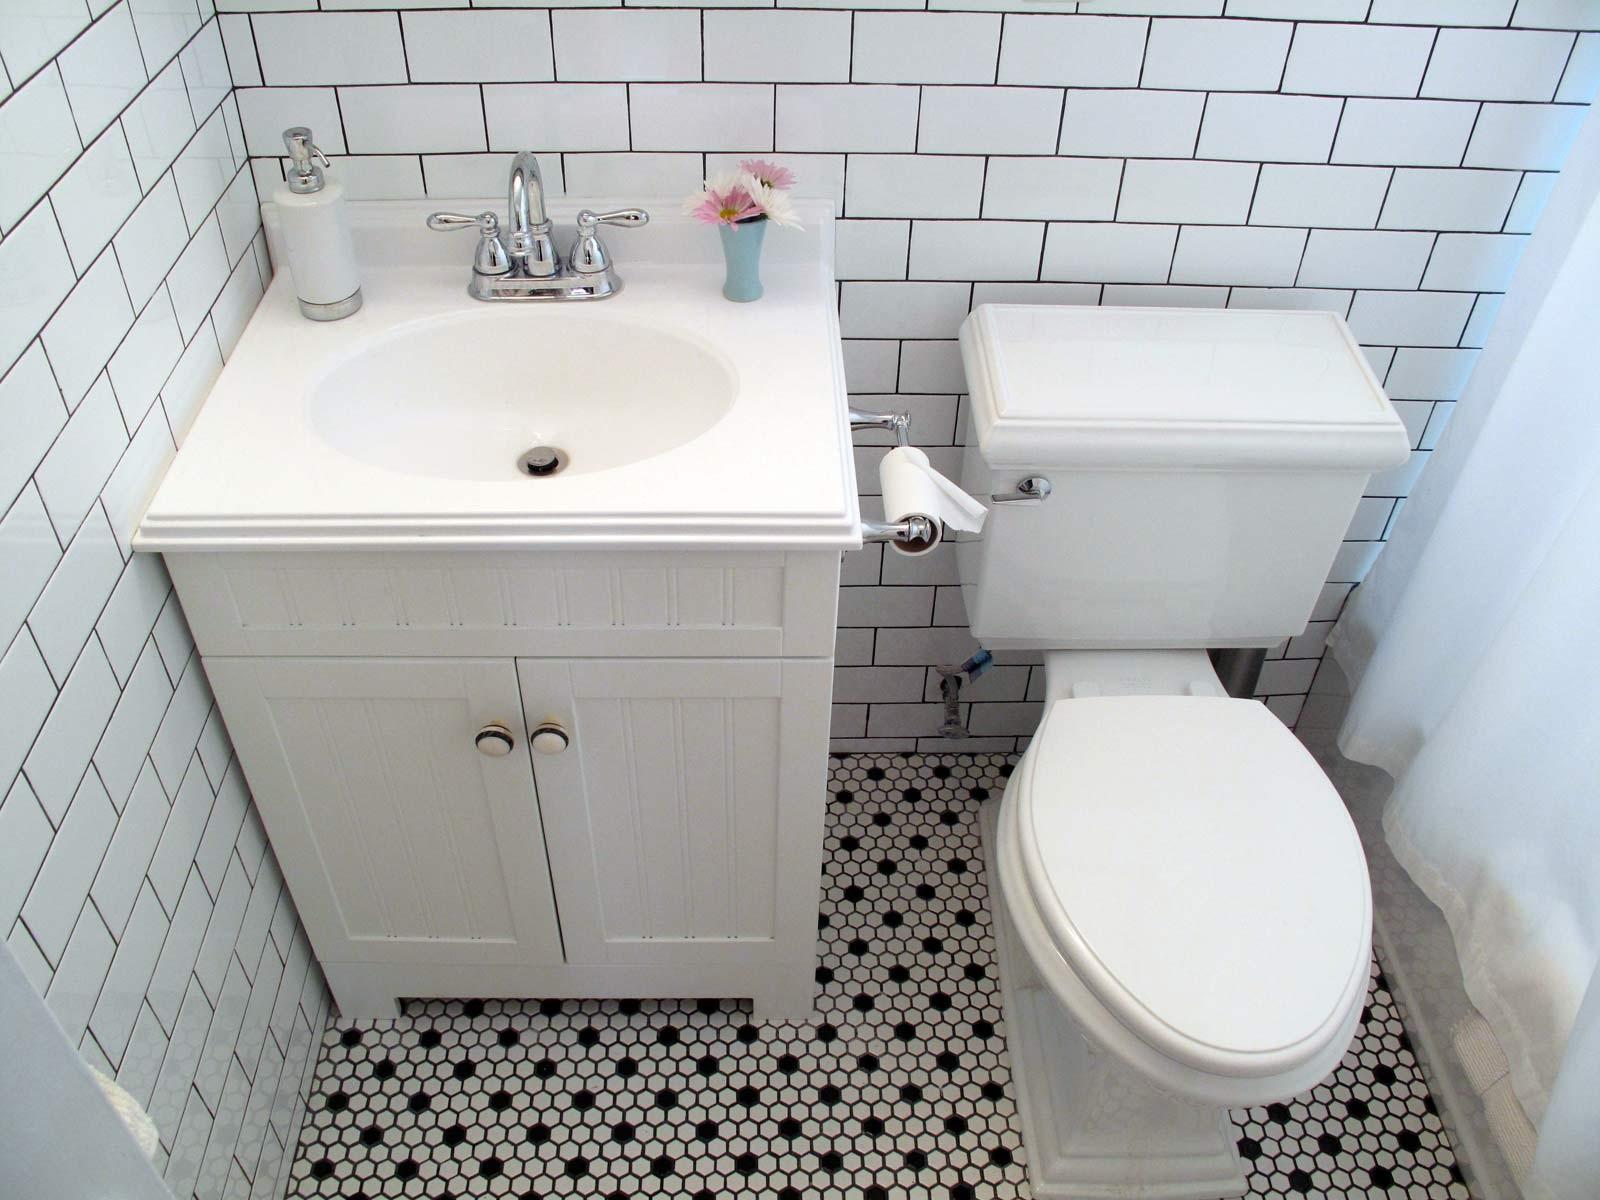 black and white bathroom tiles nz Archives - Bathroom Design Ideas ...